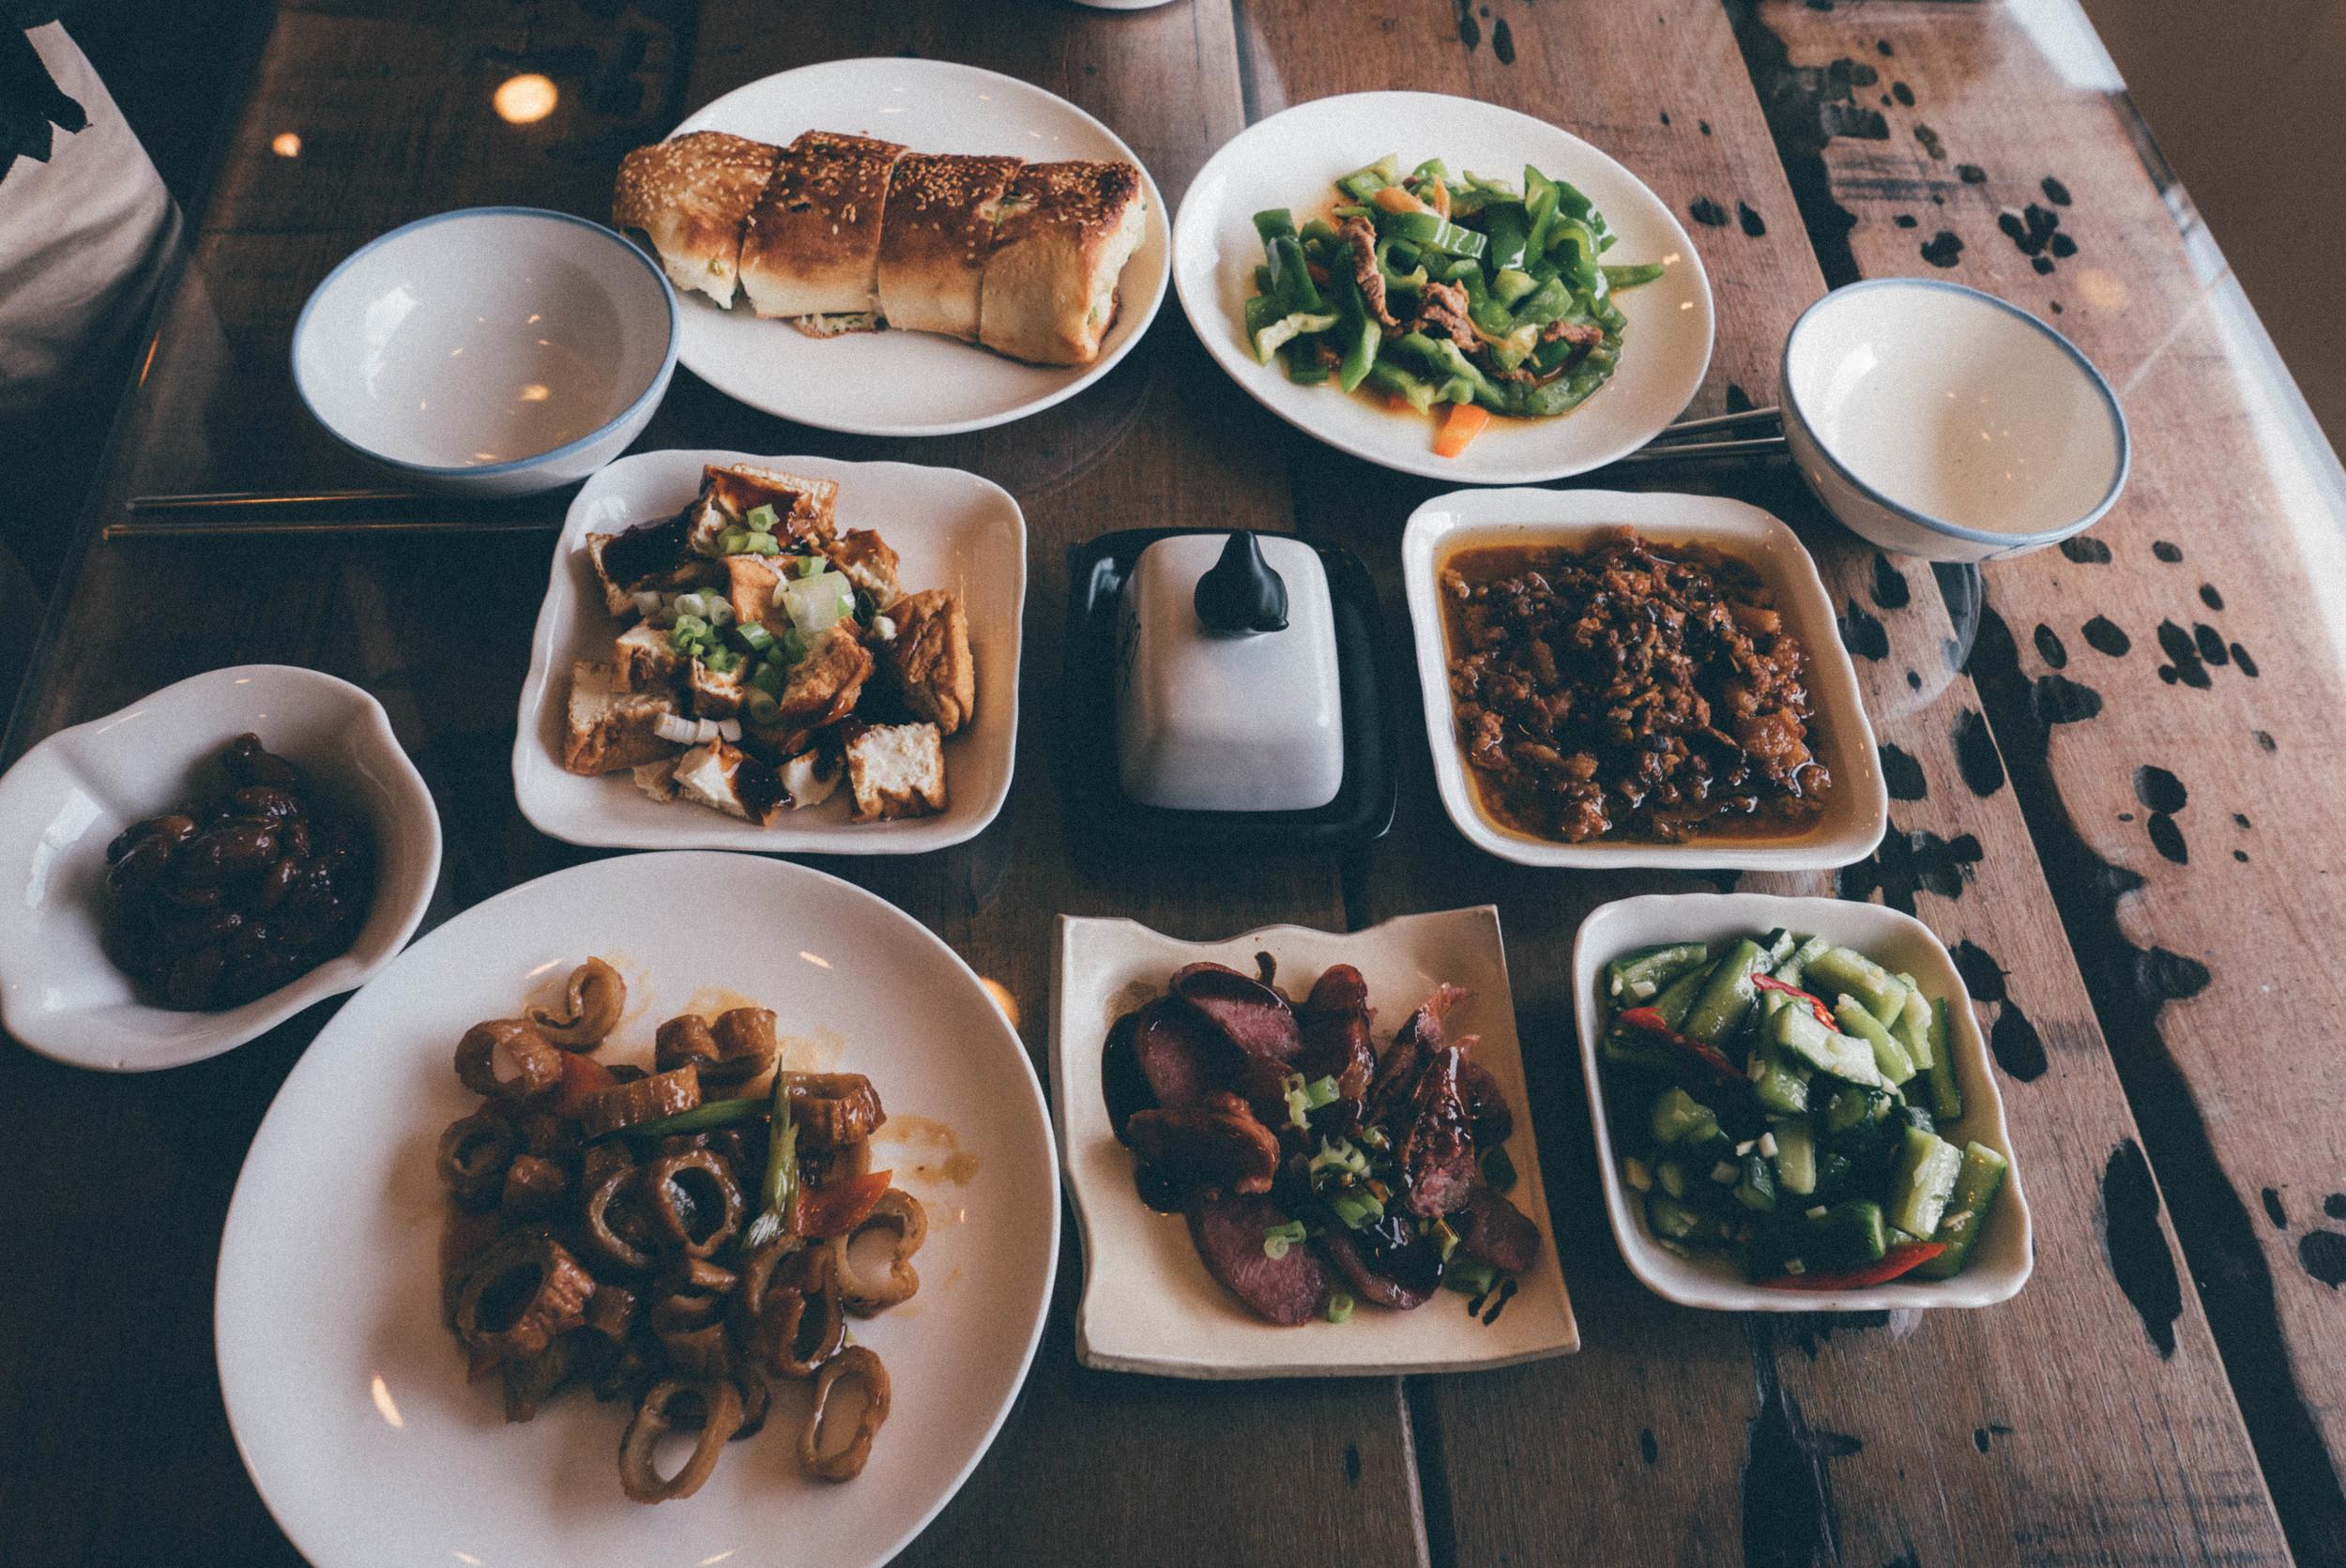 Homemade Taiwanese breakfast in Jiu Fen | blossomlink.me by @0oyukao0